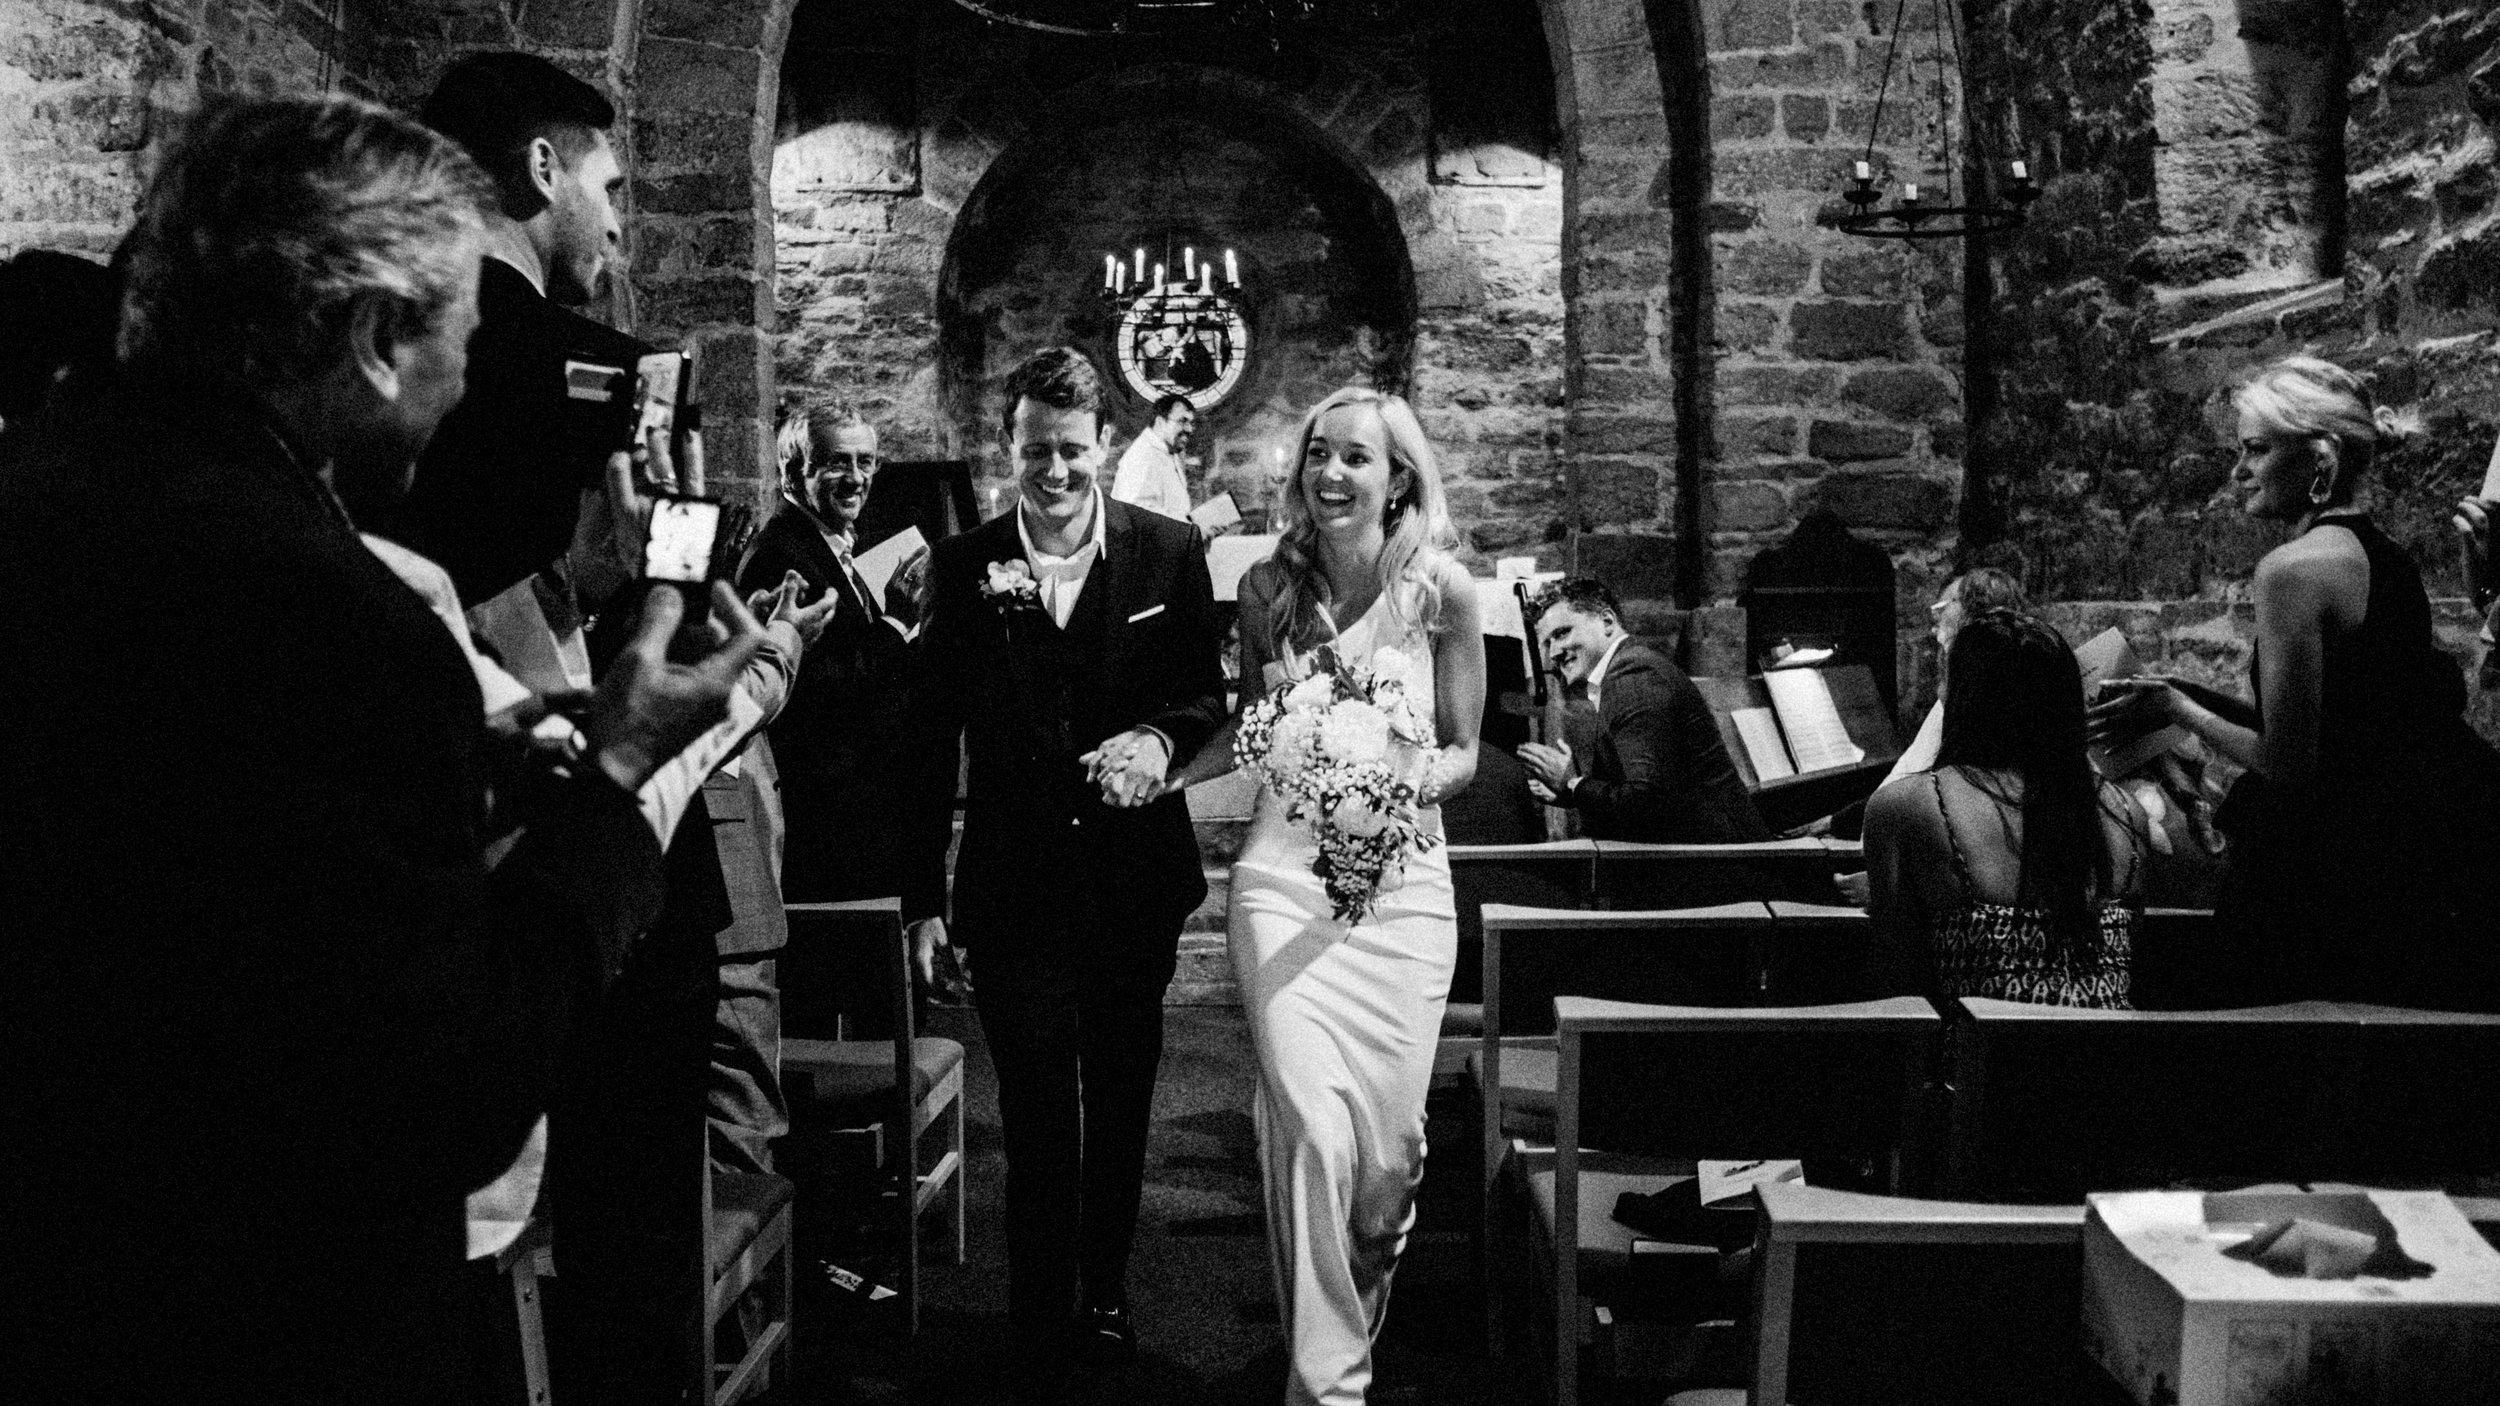 prestbury-cheshire-wedding-photographer-0014.JPG